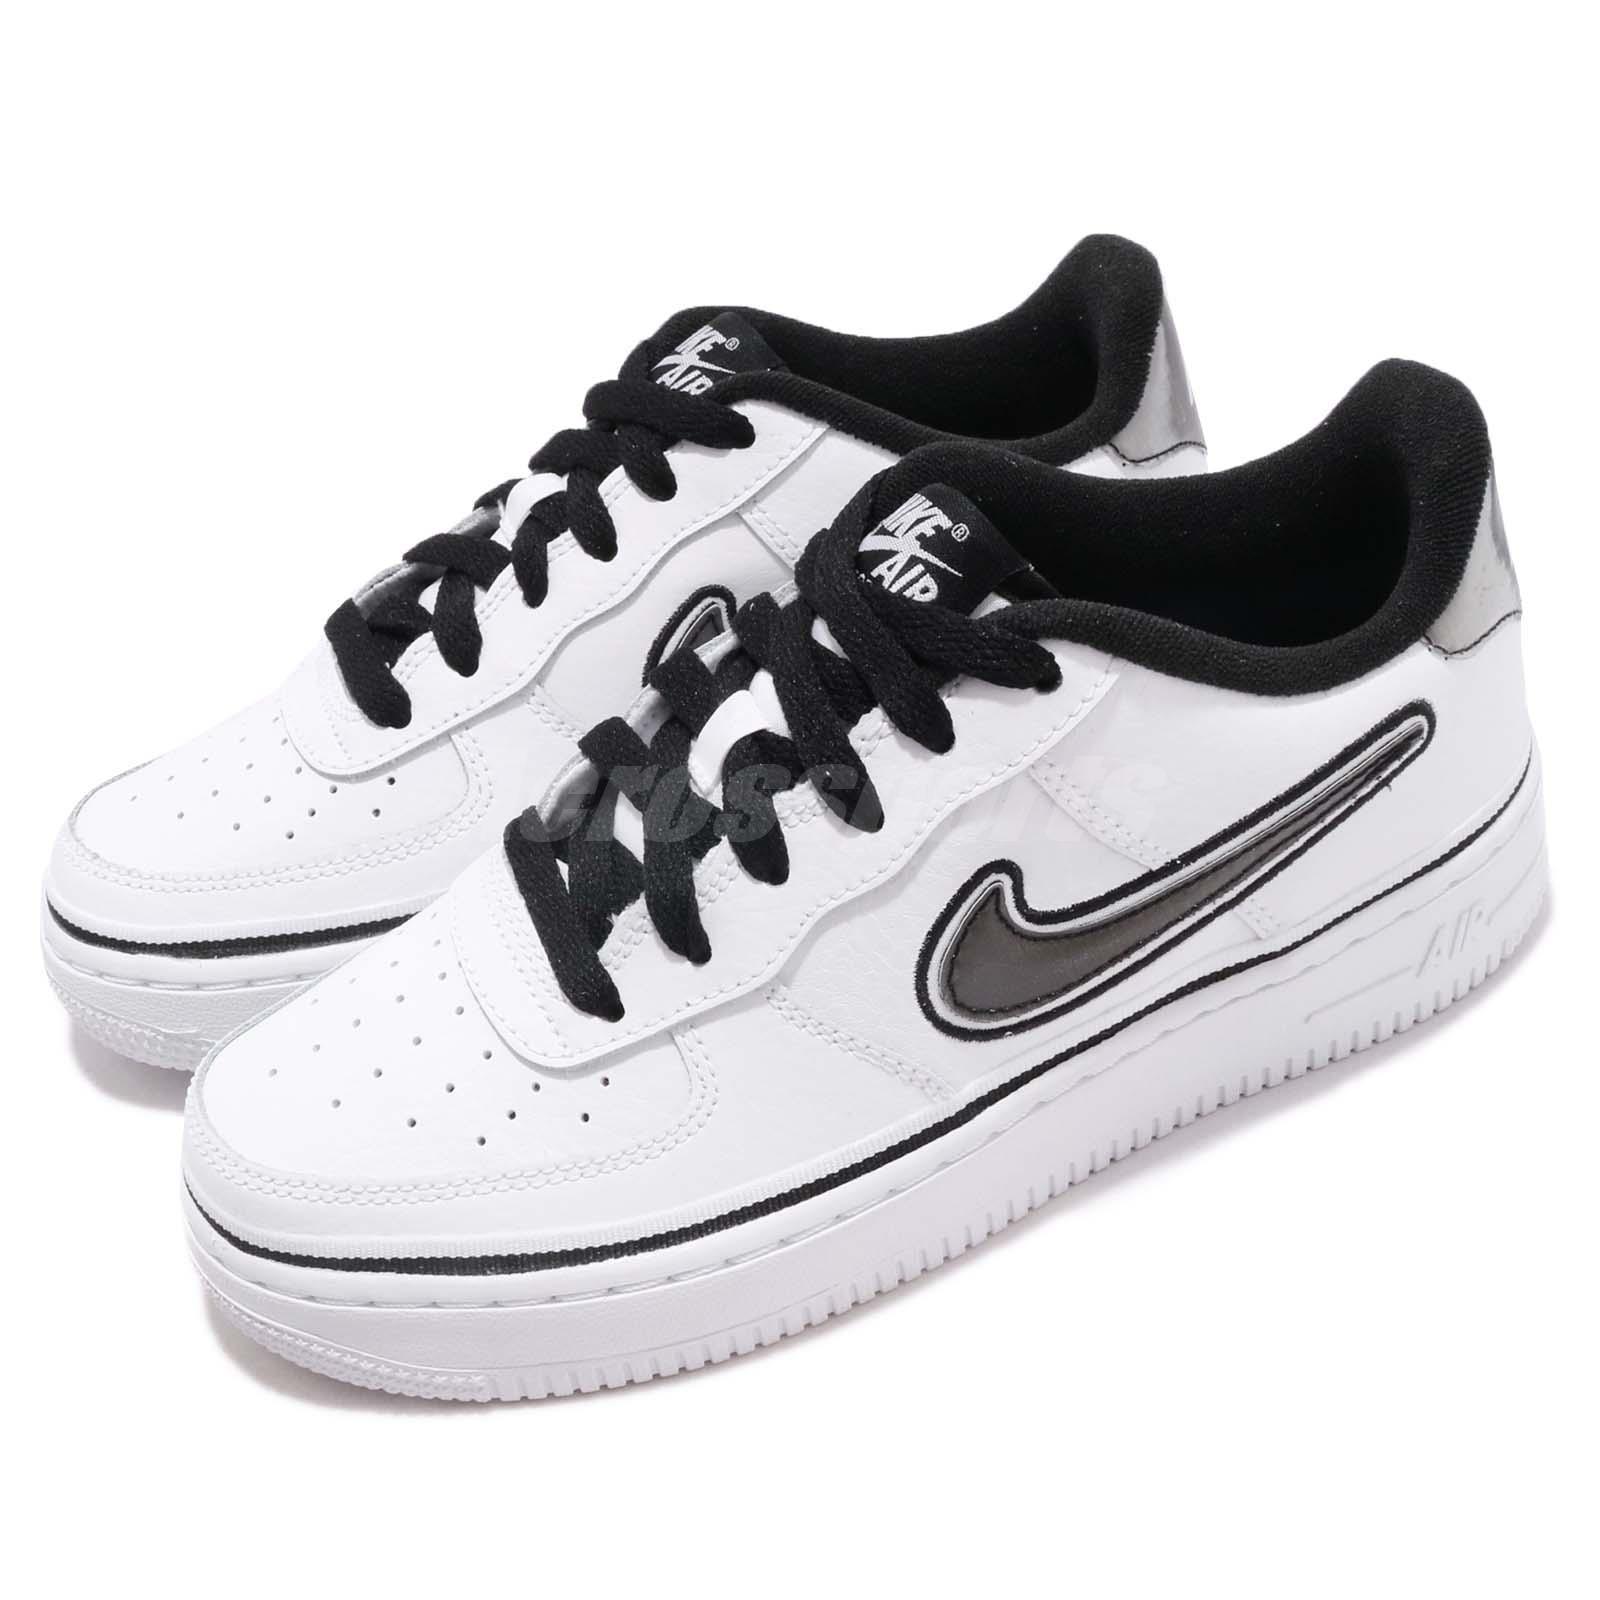 White Gs 1 About Black Lv8 Details Force Nike Kid Nba 100 Spurs Women Air Sport Af1 Ar0734 6fv7IYbgy